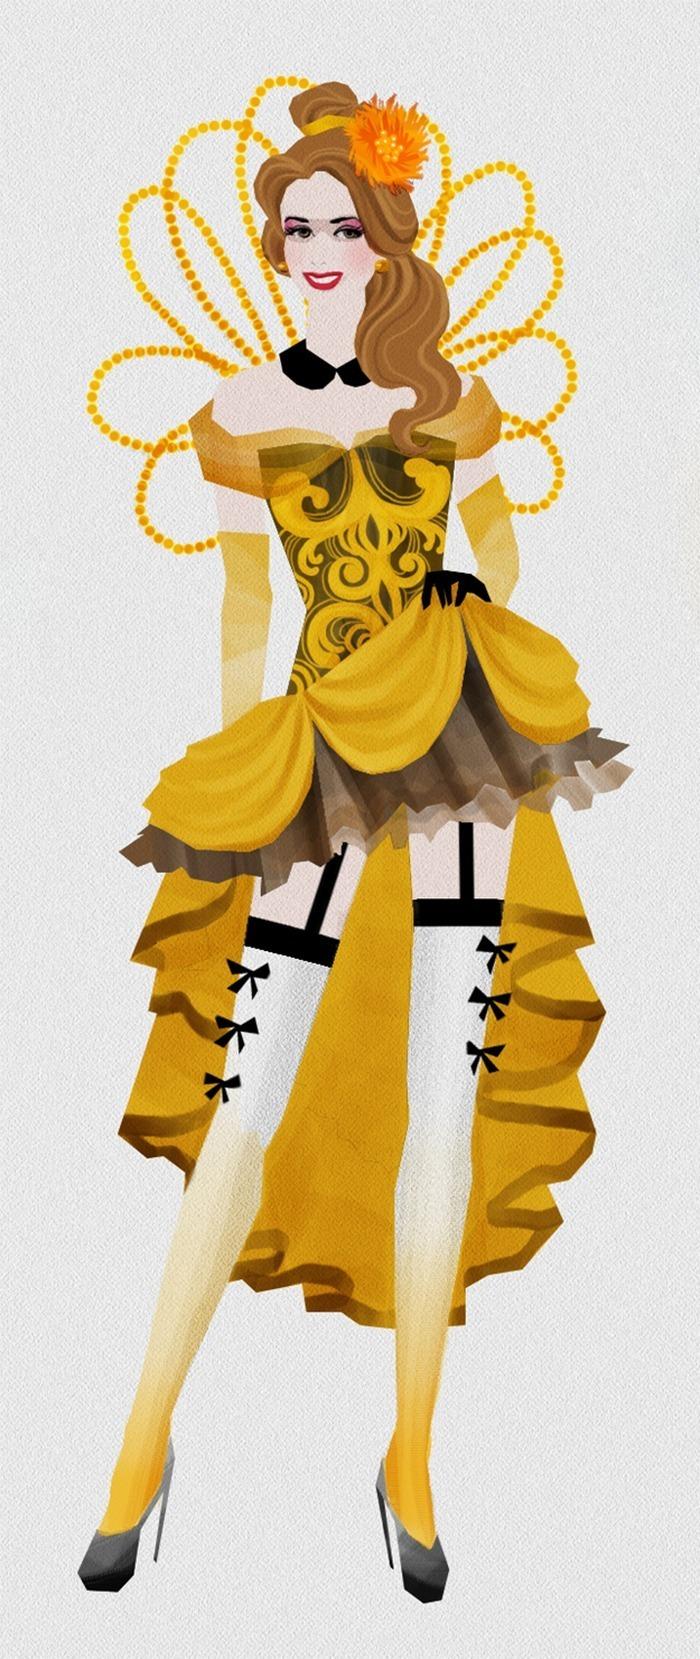 princesas-disney-burlescas-5